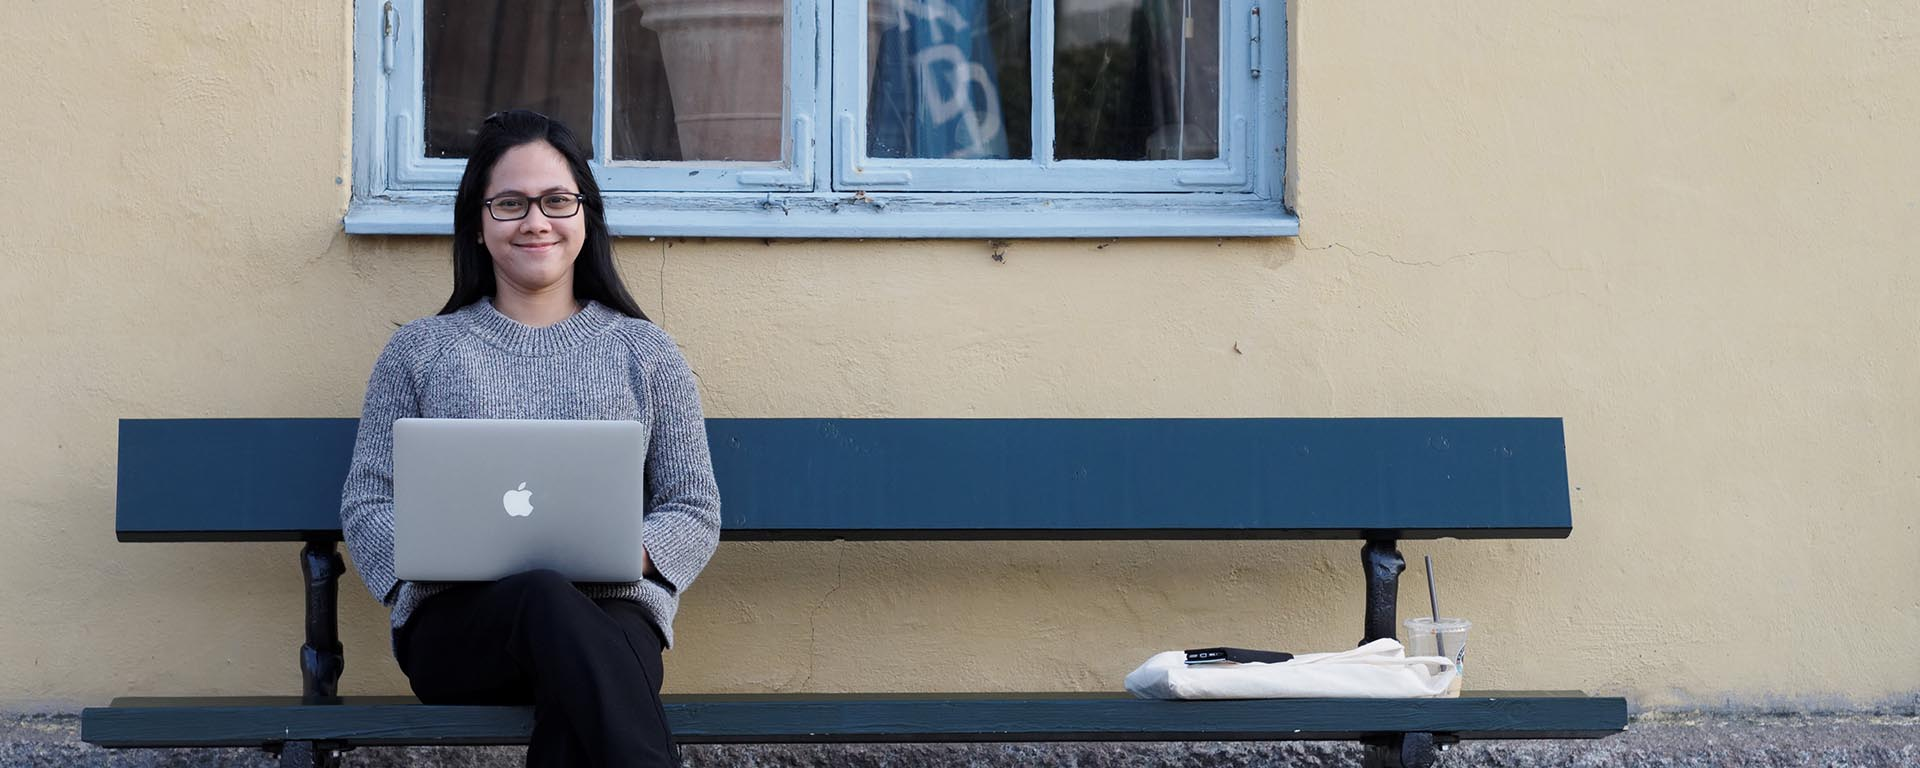 Kontak Nordic Student Service